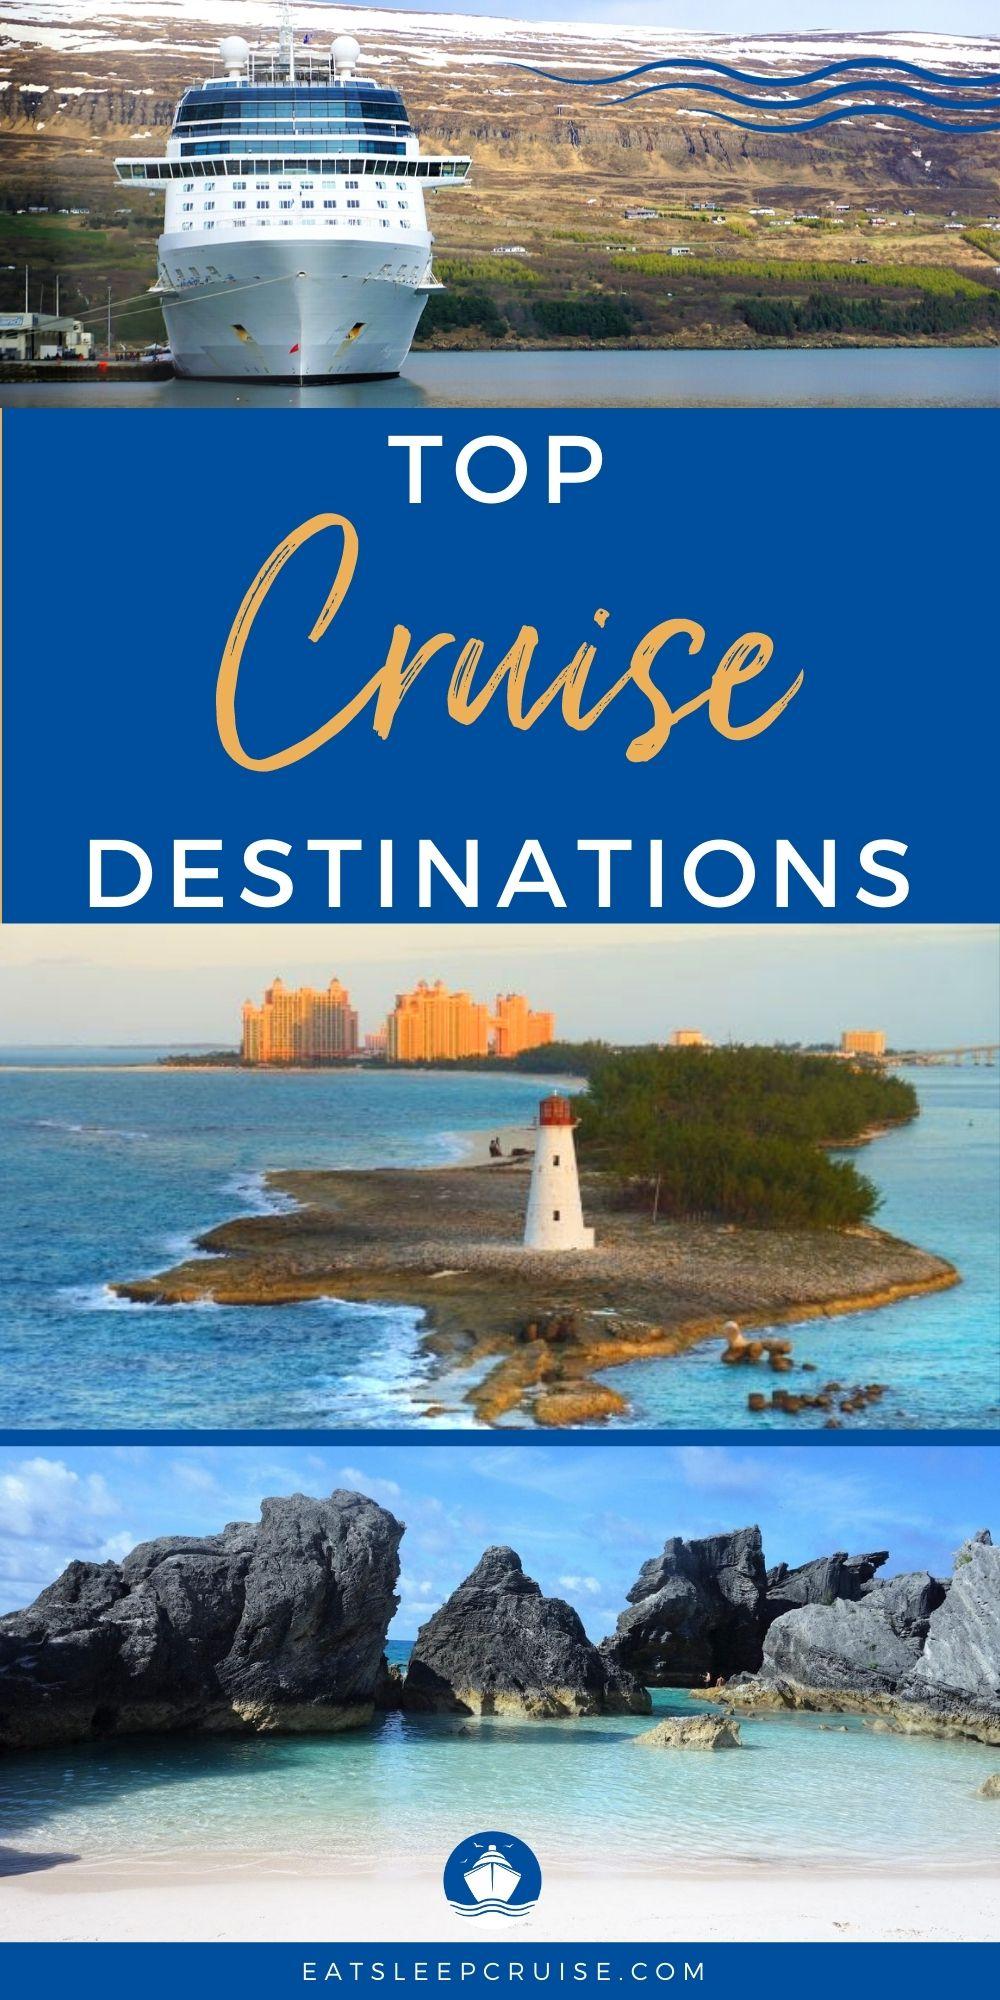 Top Cruise Destinations